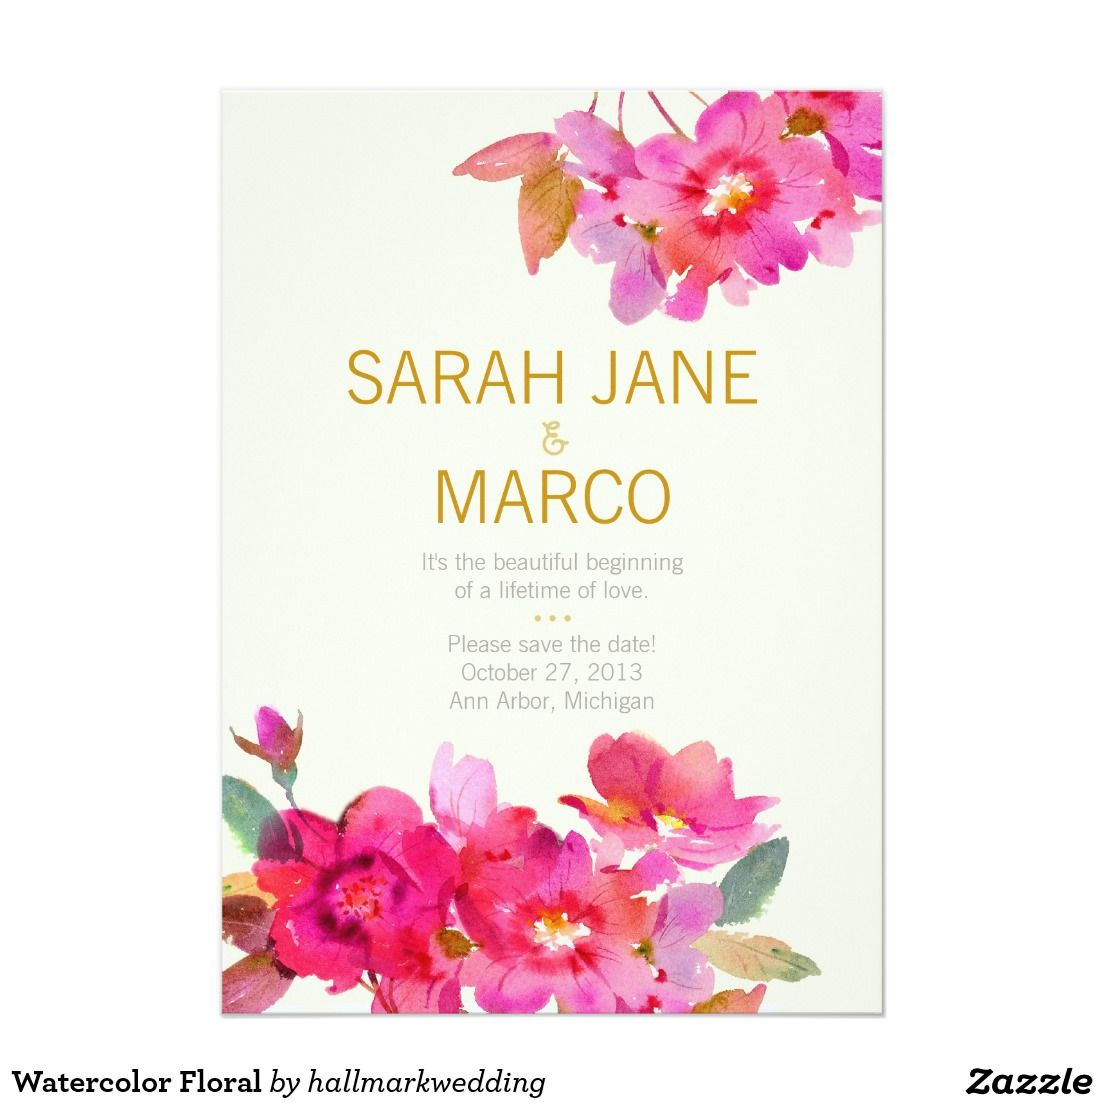 Watercolor Floral 5x7 Paper Invitation Card. Artwork Designed By Hallmark  Wedding. Price $2.01 Per